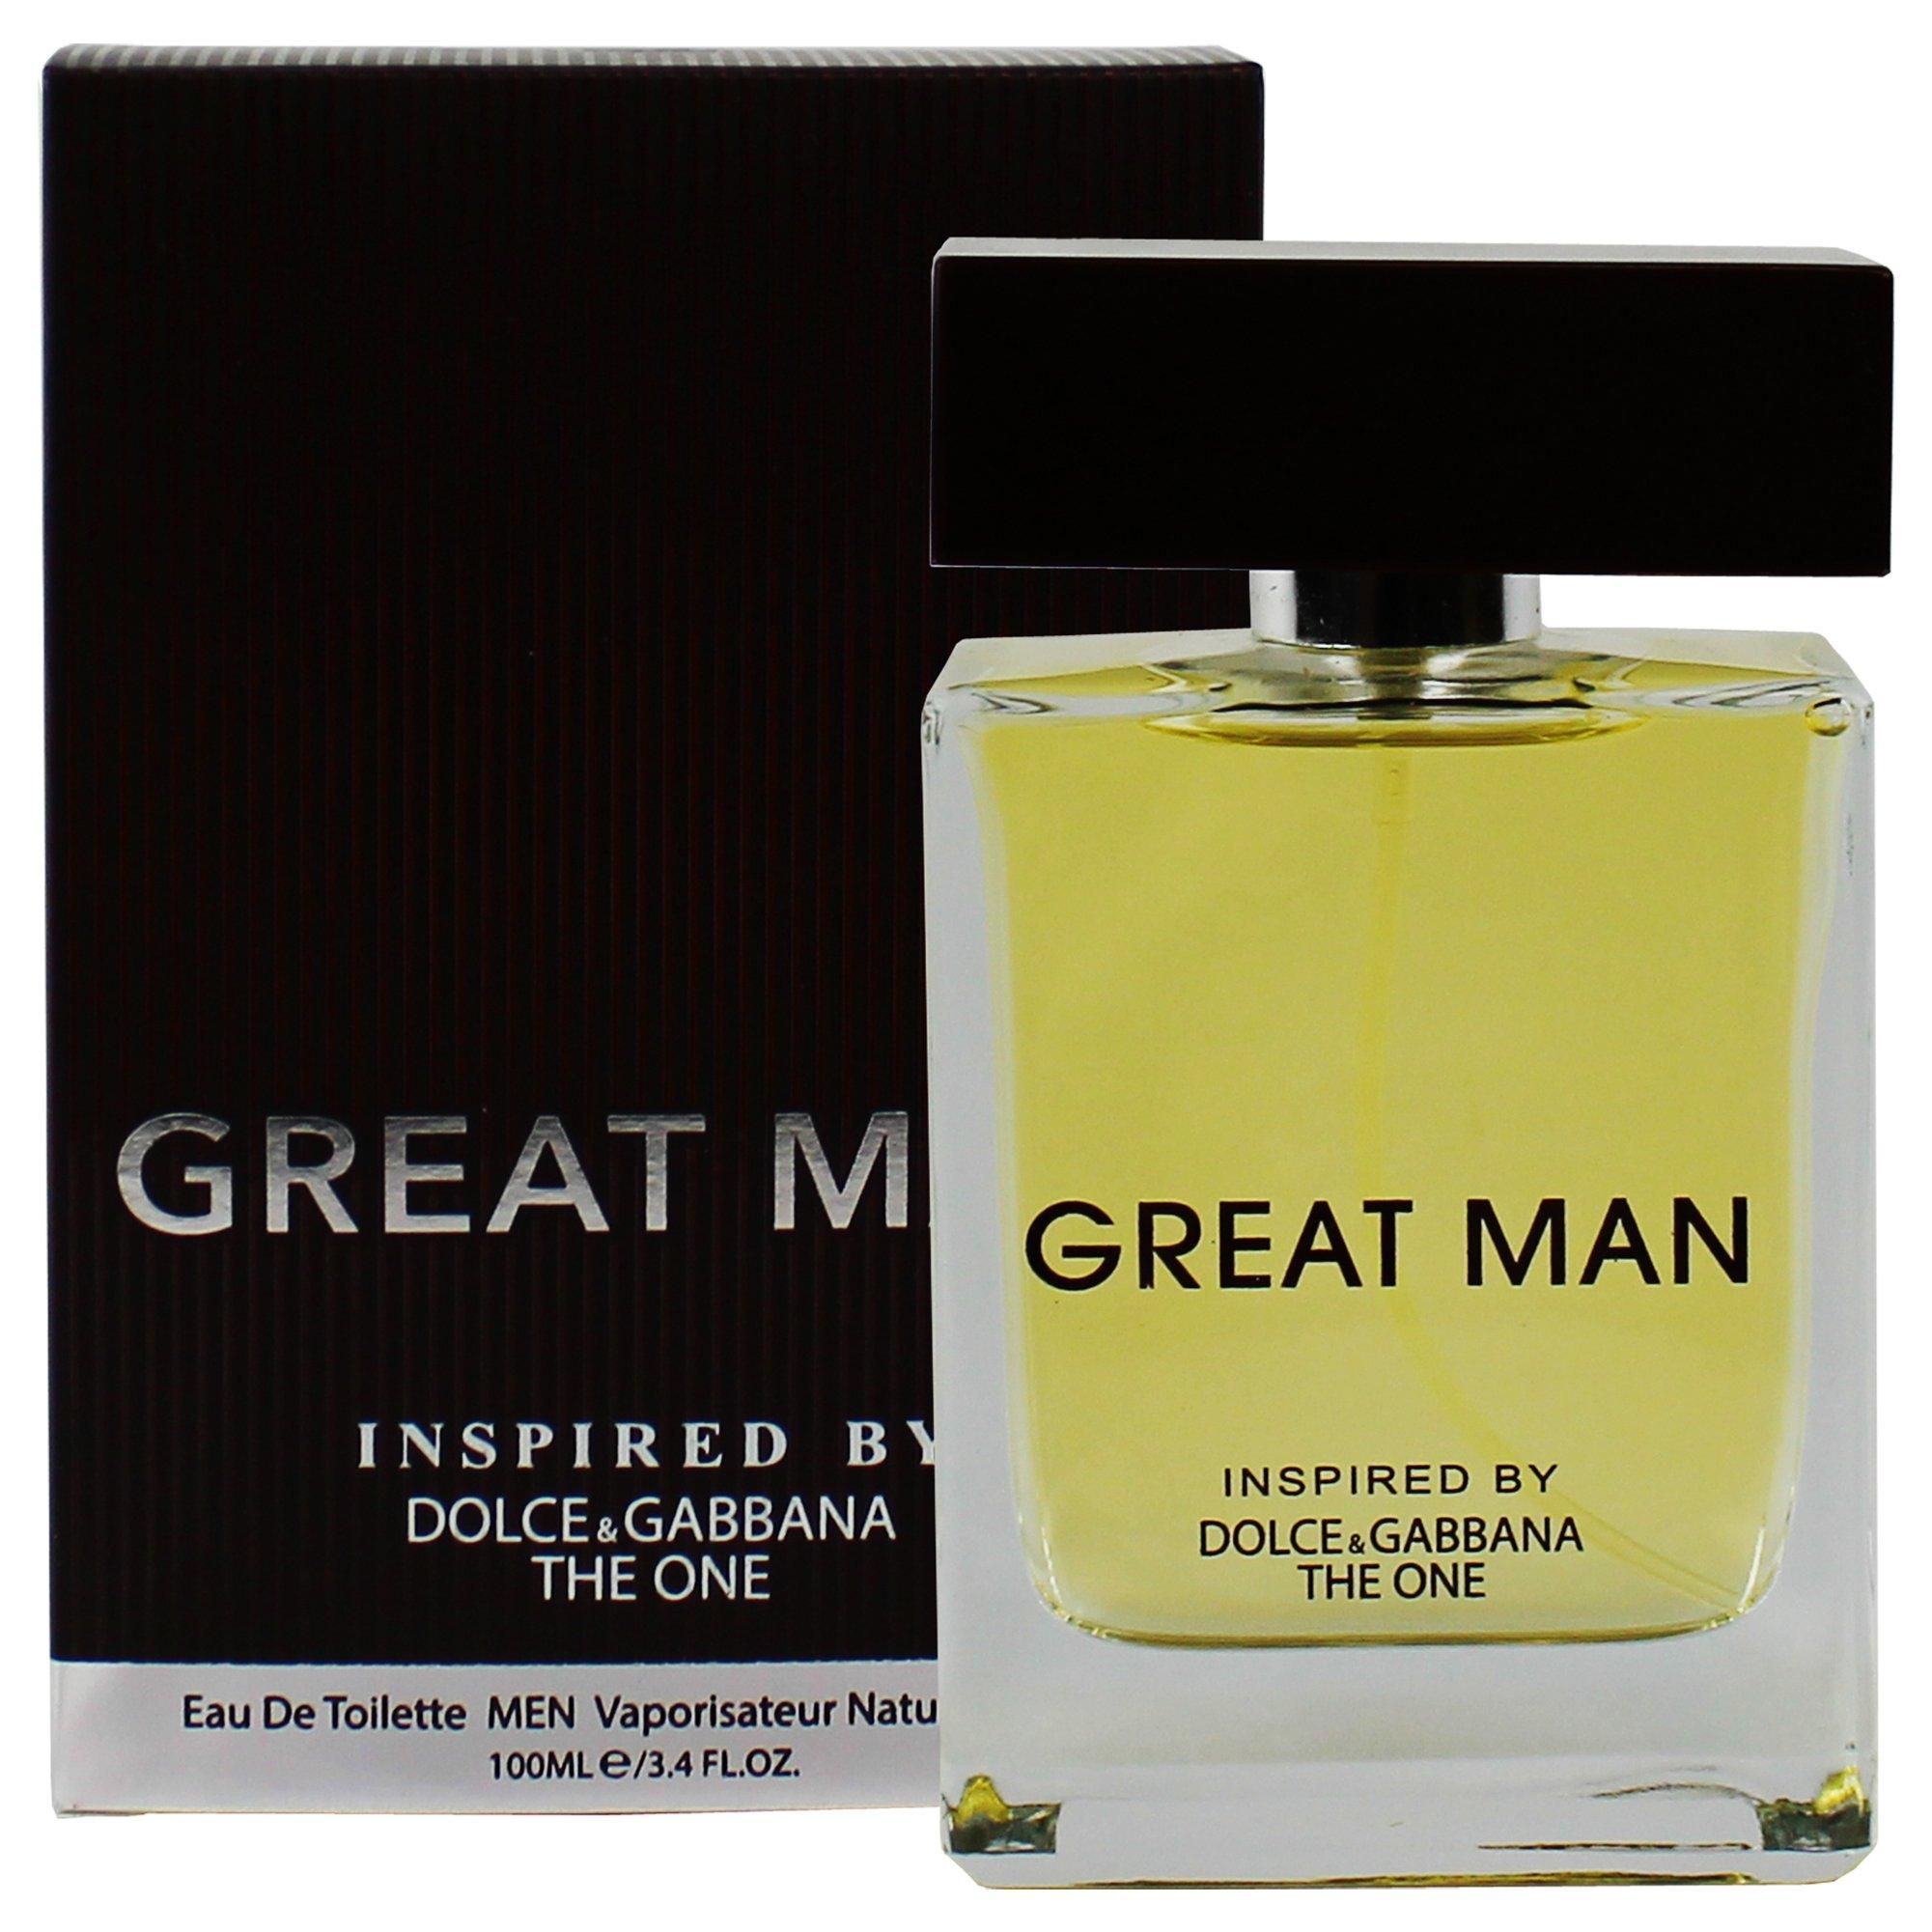 Amazon.com   Great Man For Men, Eau De Toilette 3.3 Fl. Oz.  100 ml -  Inspired By The One Cologne   Beauty c54aeb52ea